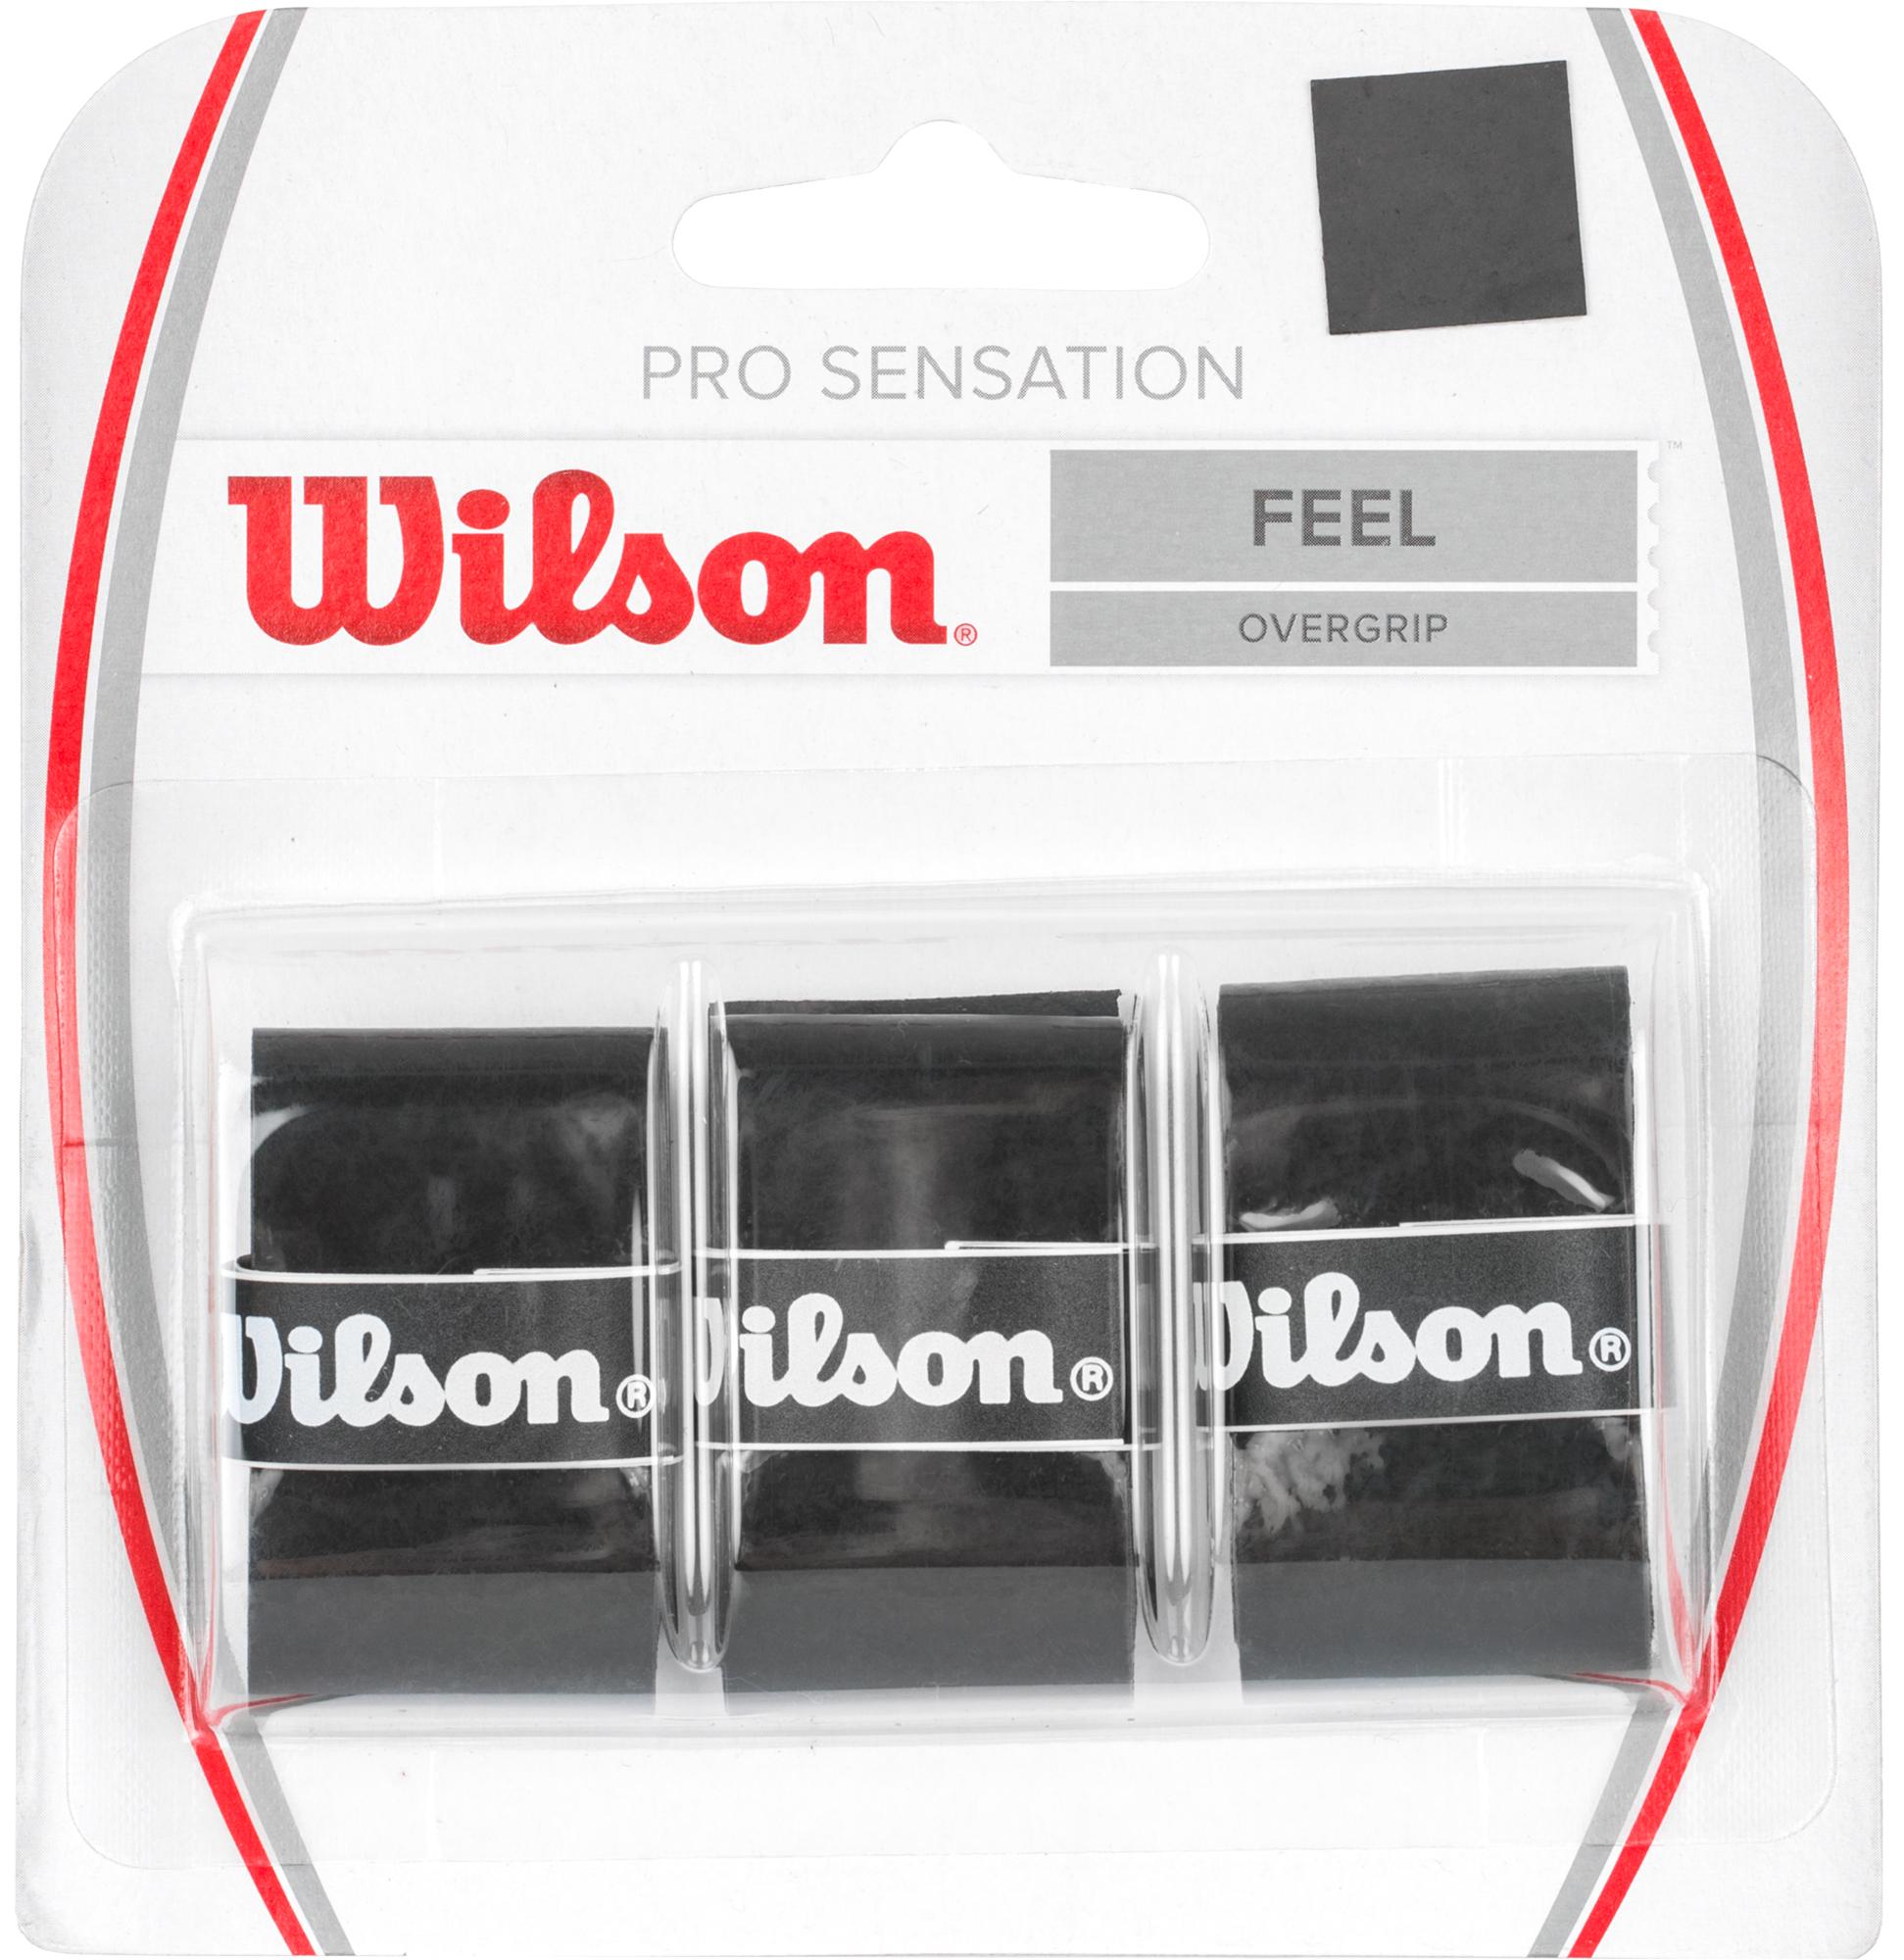 Wilson Намотка Wilson Pro Overgrip Sensation wilson намотка базовая wilson cushion pro repl grip bk